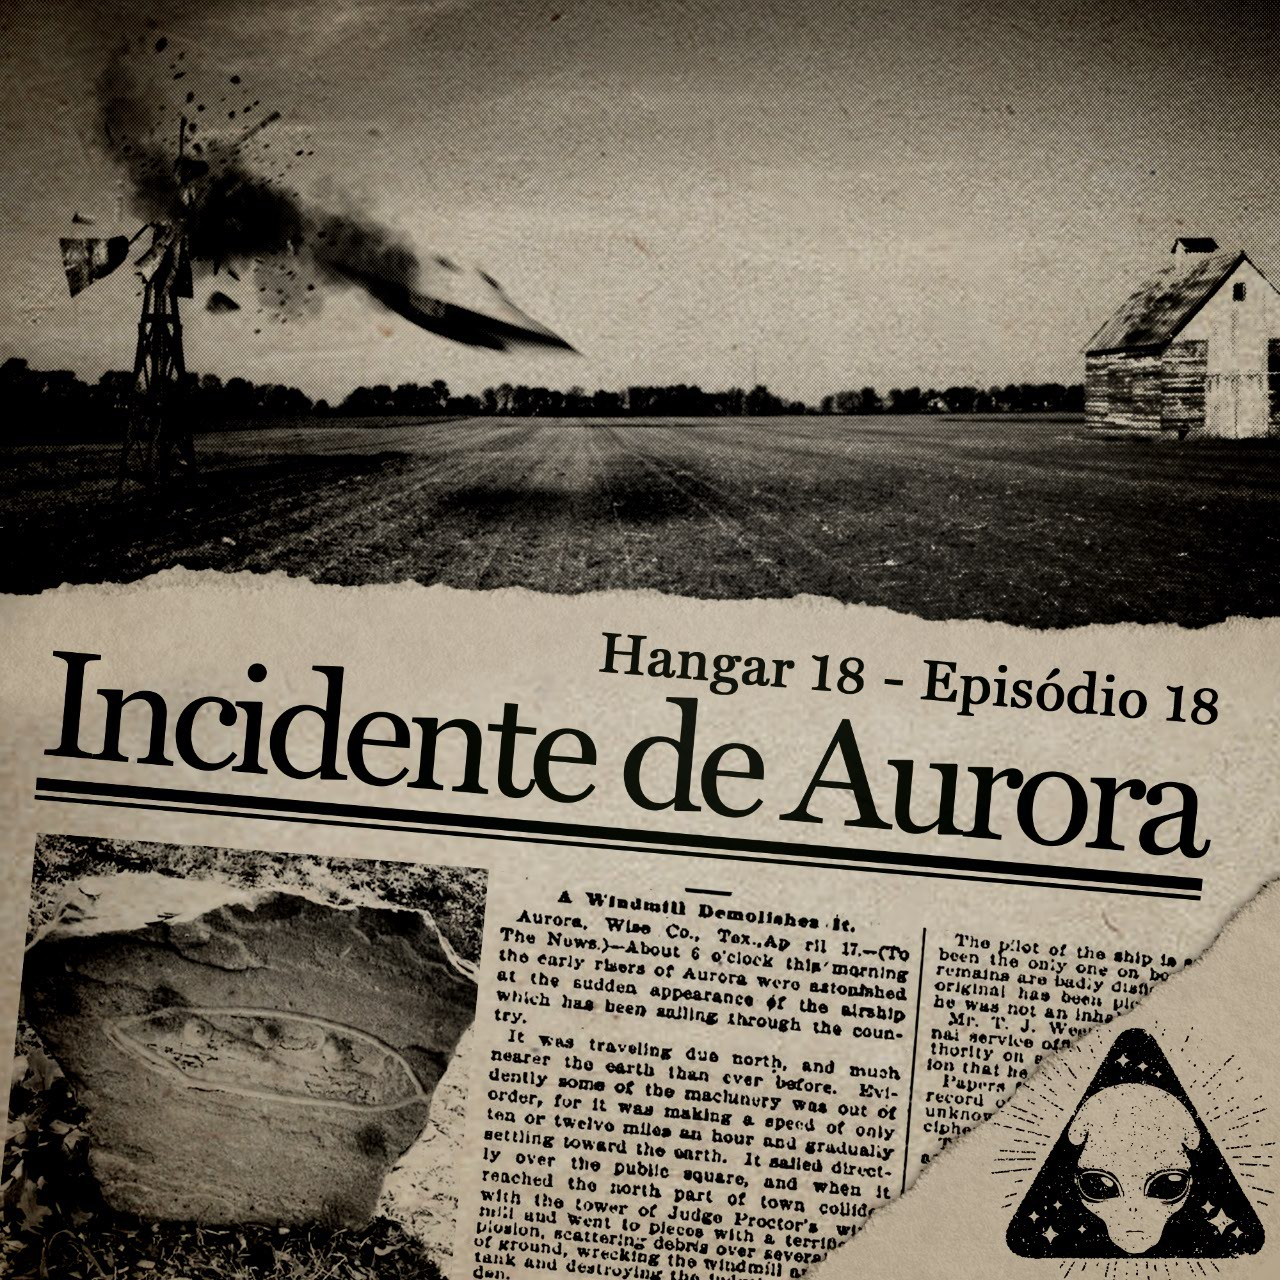 Hangar 18 - Ep 018 - Incidente de Aurora